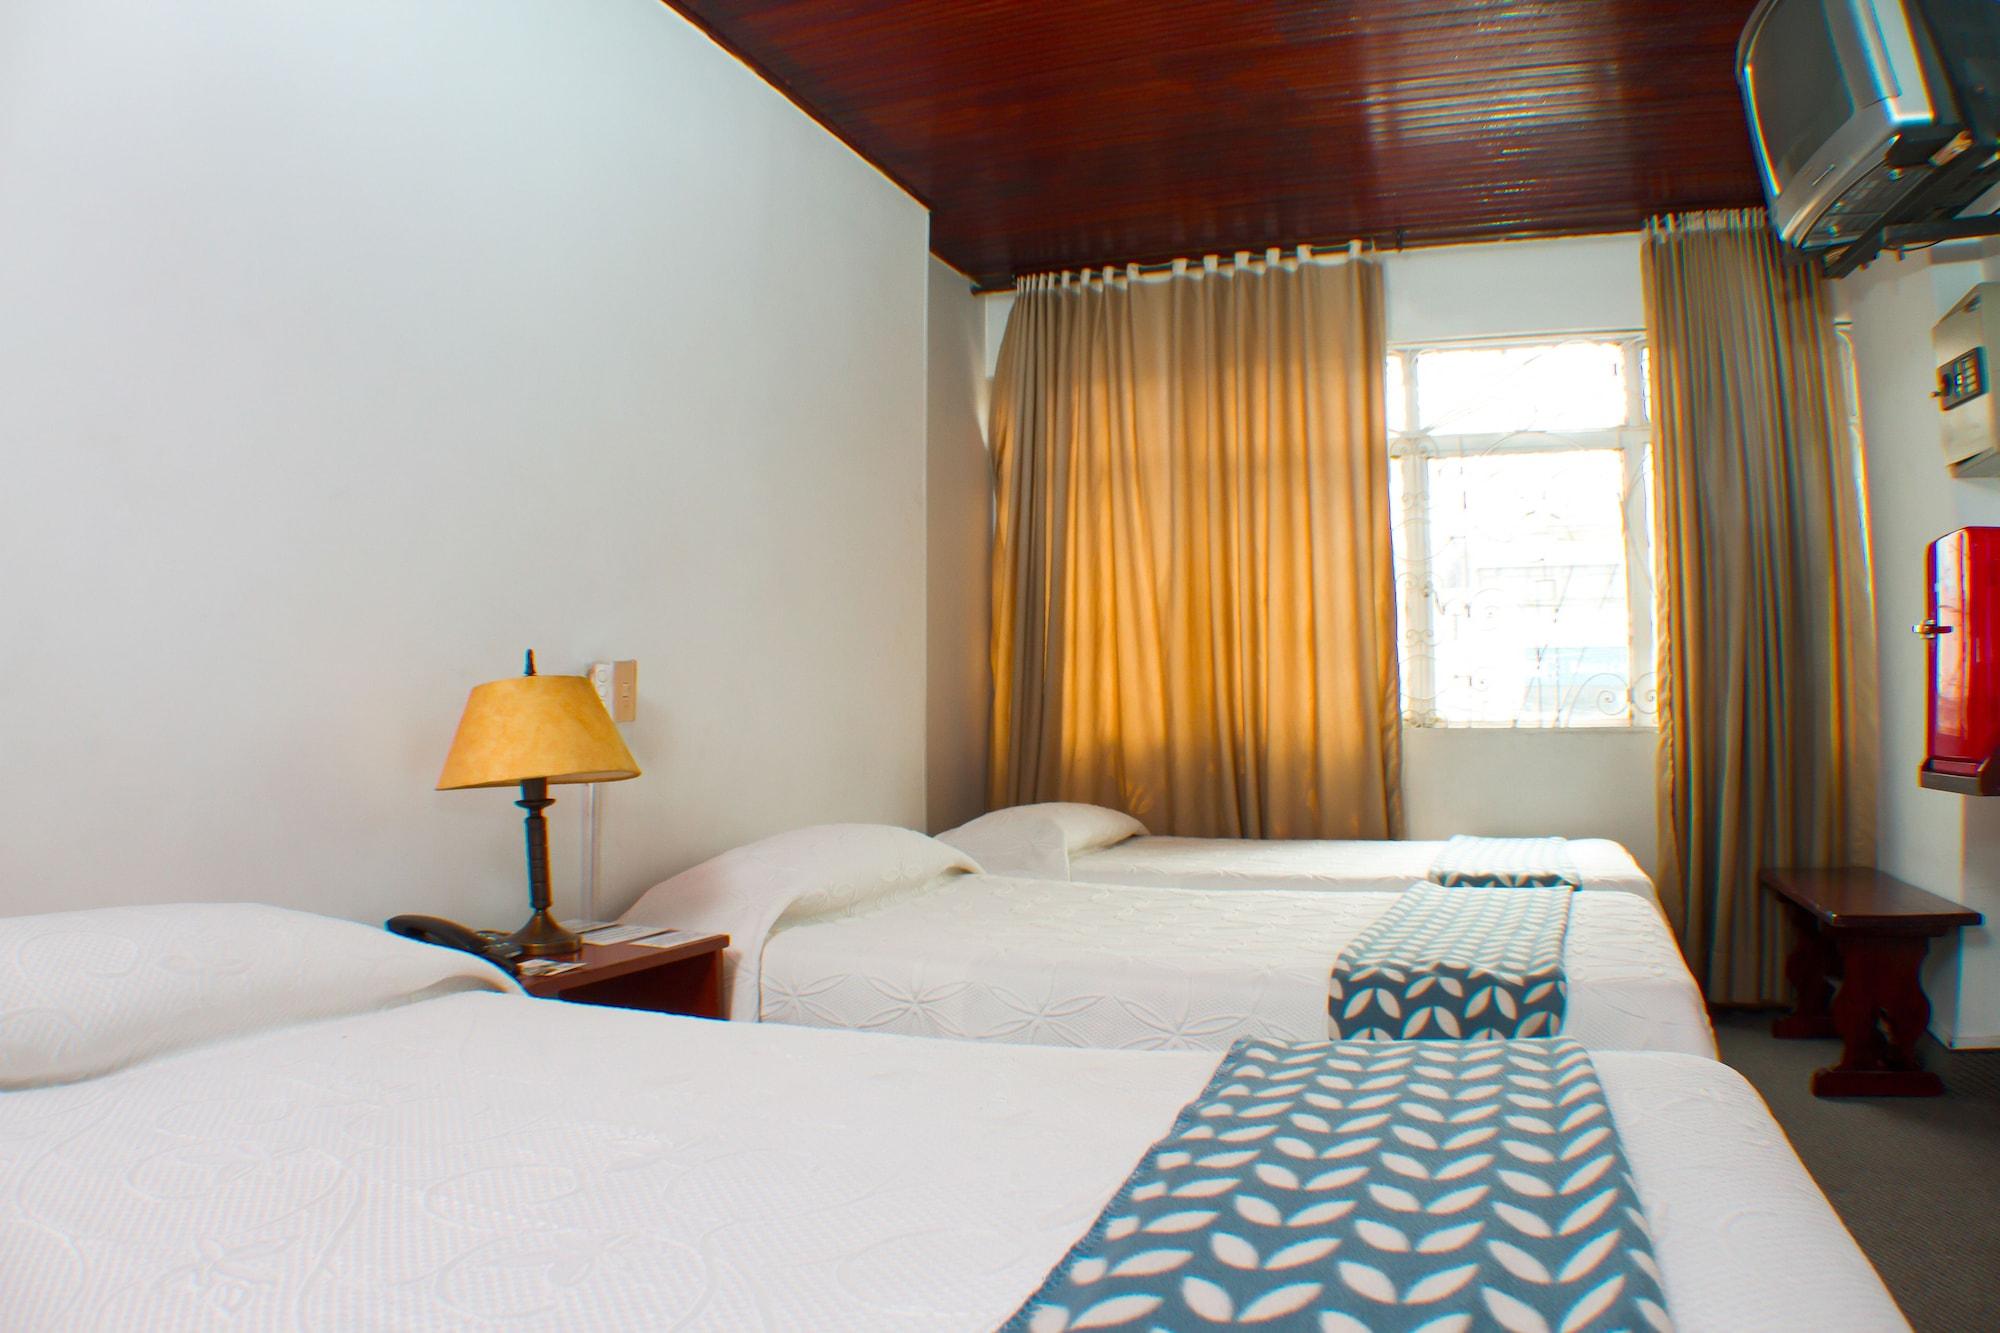 Hotel Siar, Santafé de Bogotá